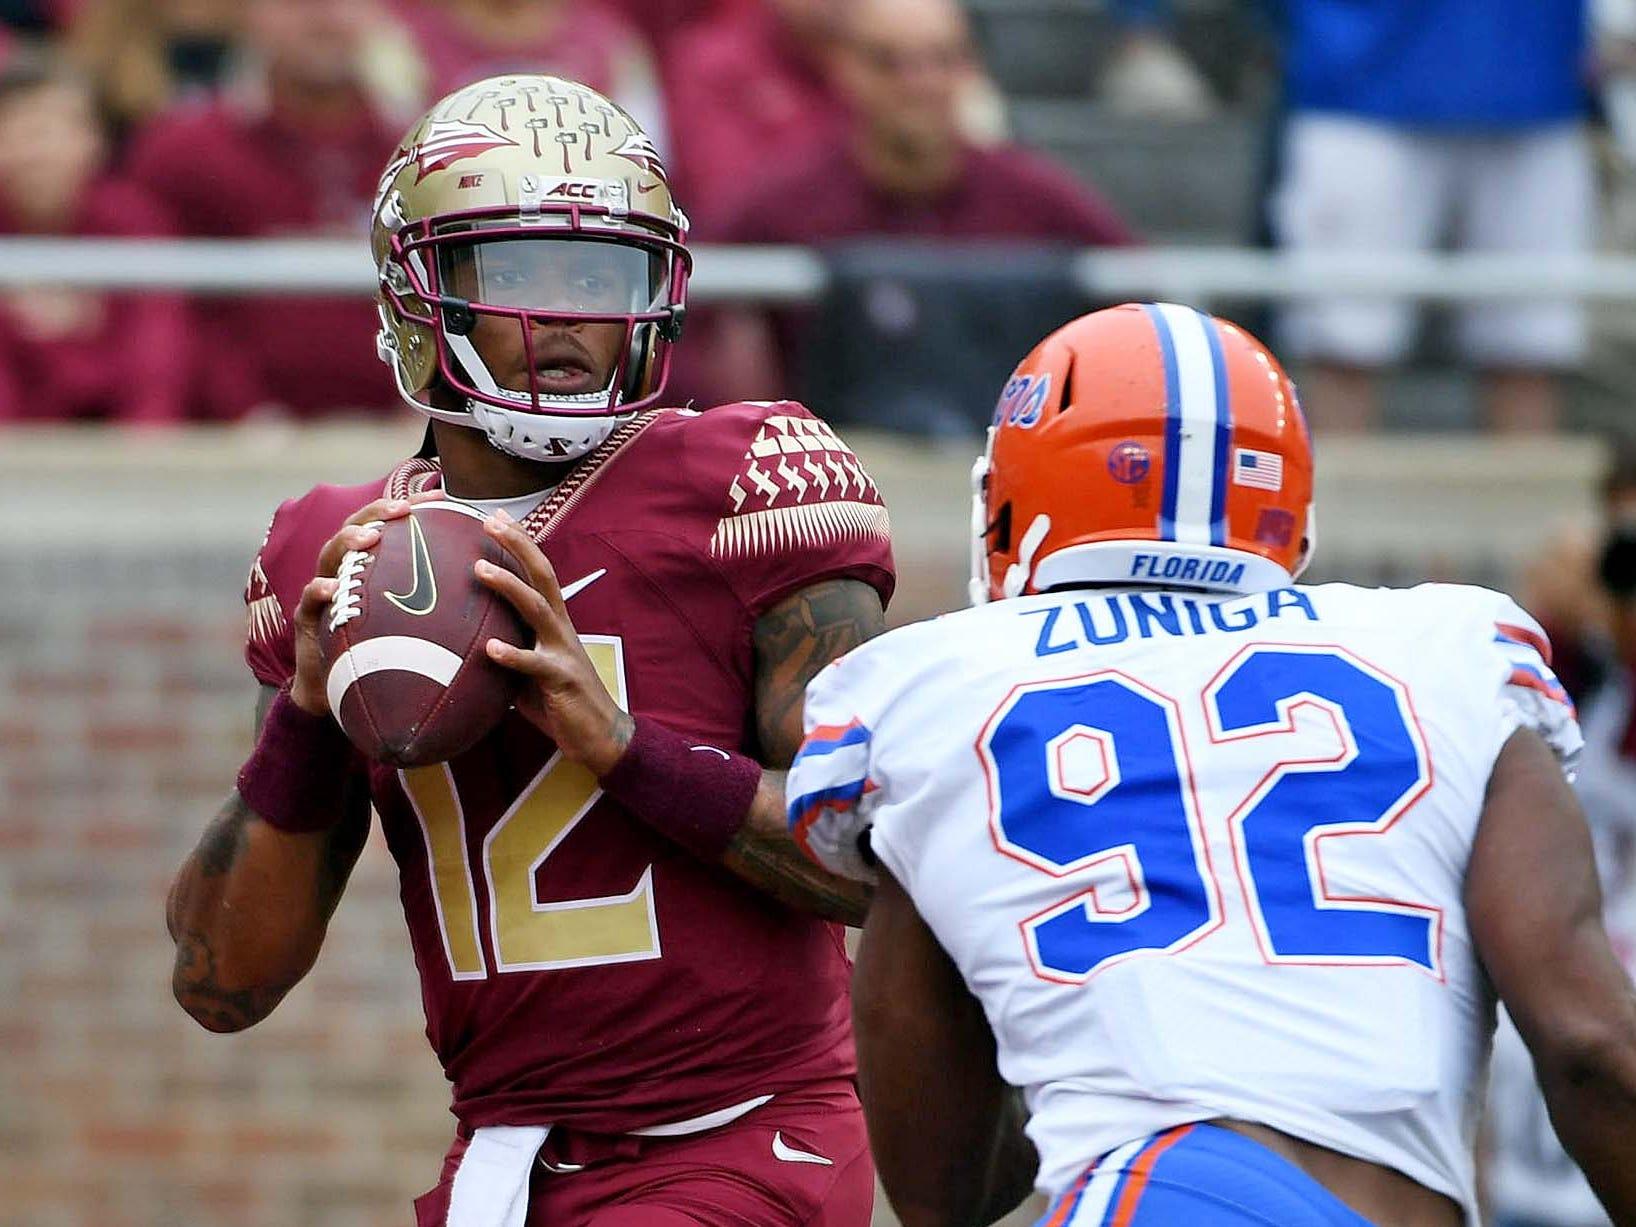 Florida State Seminoles quarterback Deondre Francois (12) looks to throw as Florida Gators defensive lineman Jabari Zuniga (92) closes in during the first half at Doak Campbell Stadium.